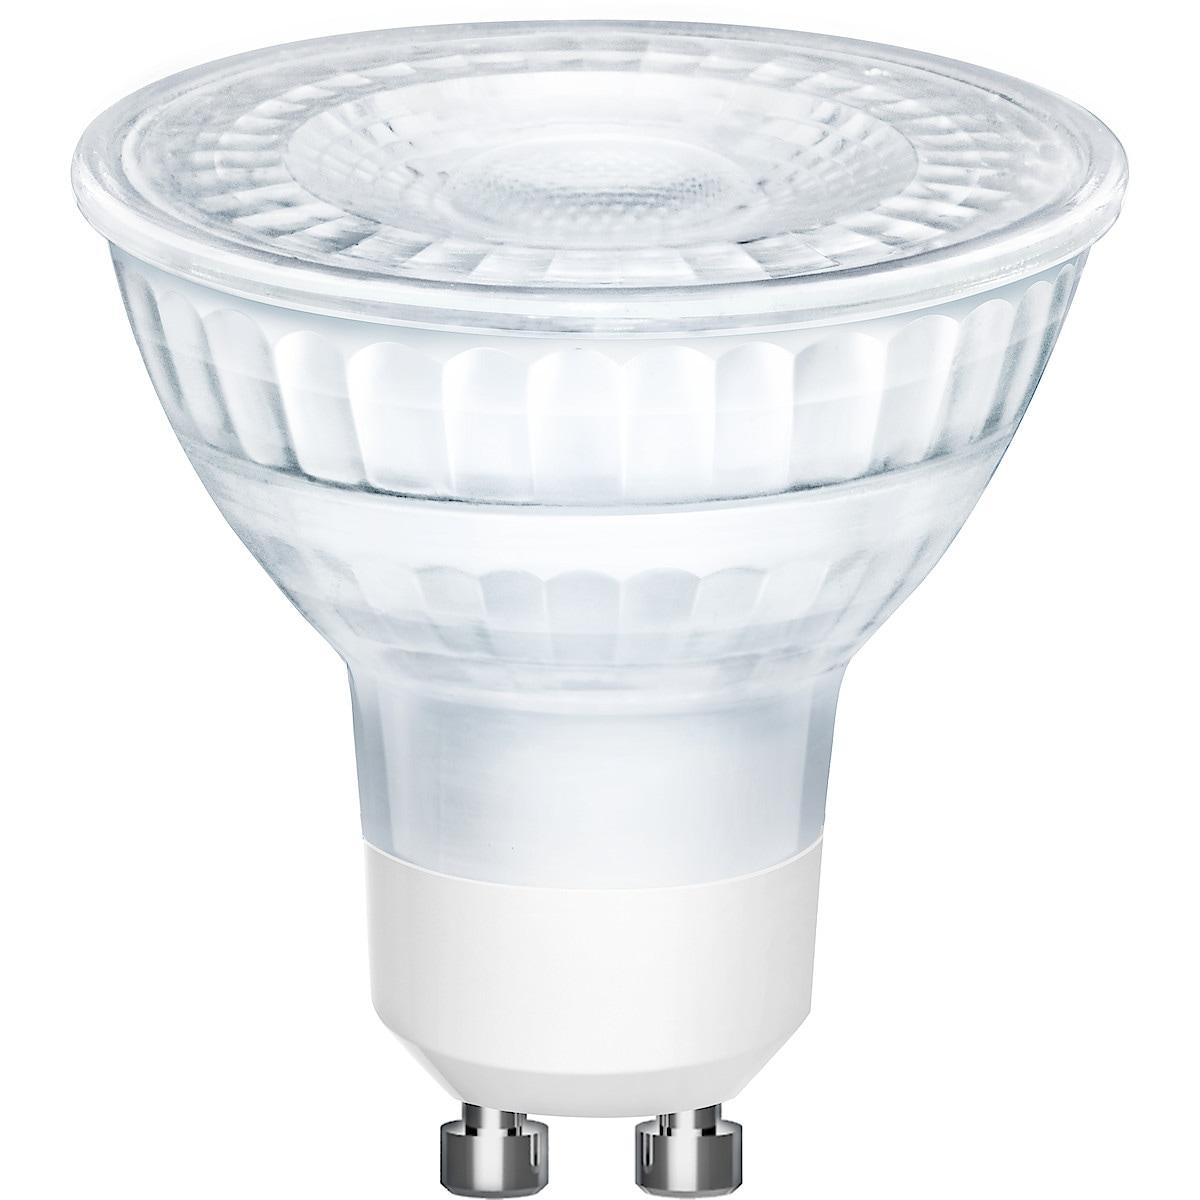 LED-lampa GU10 kallvit Clas Ohlson